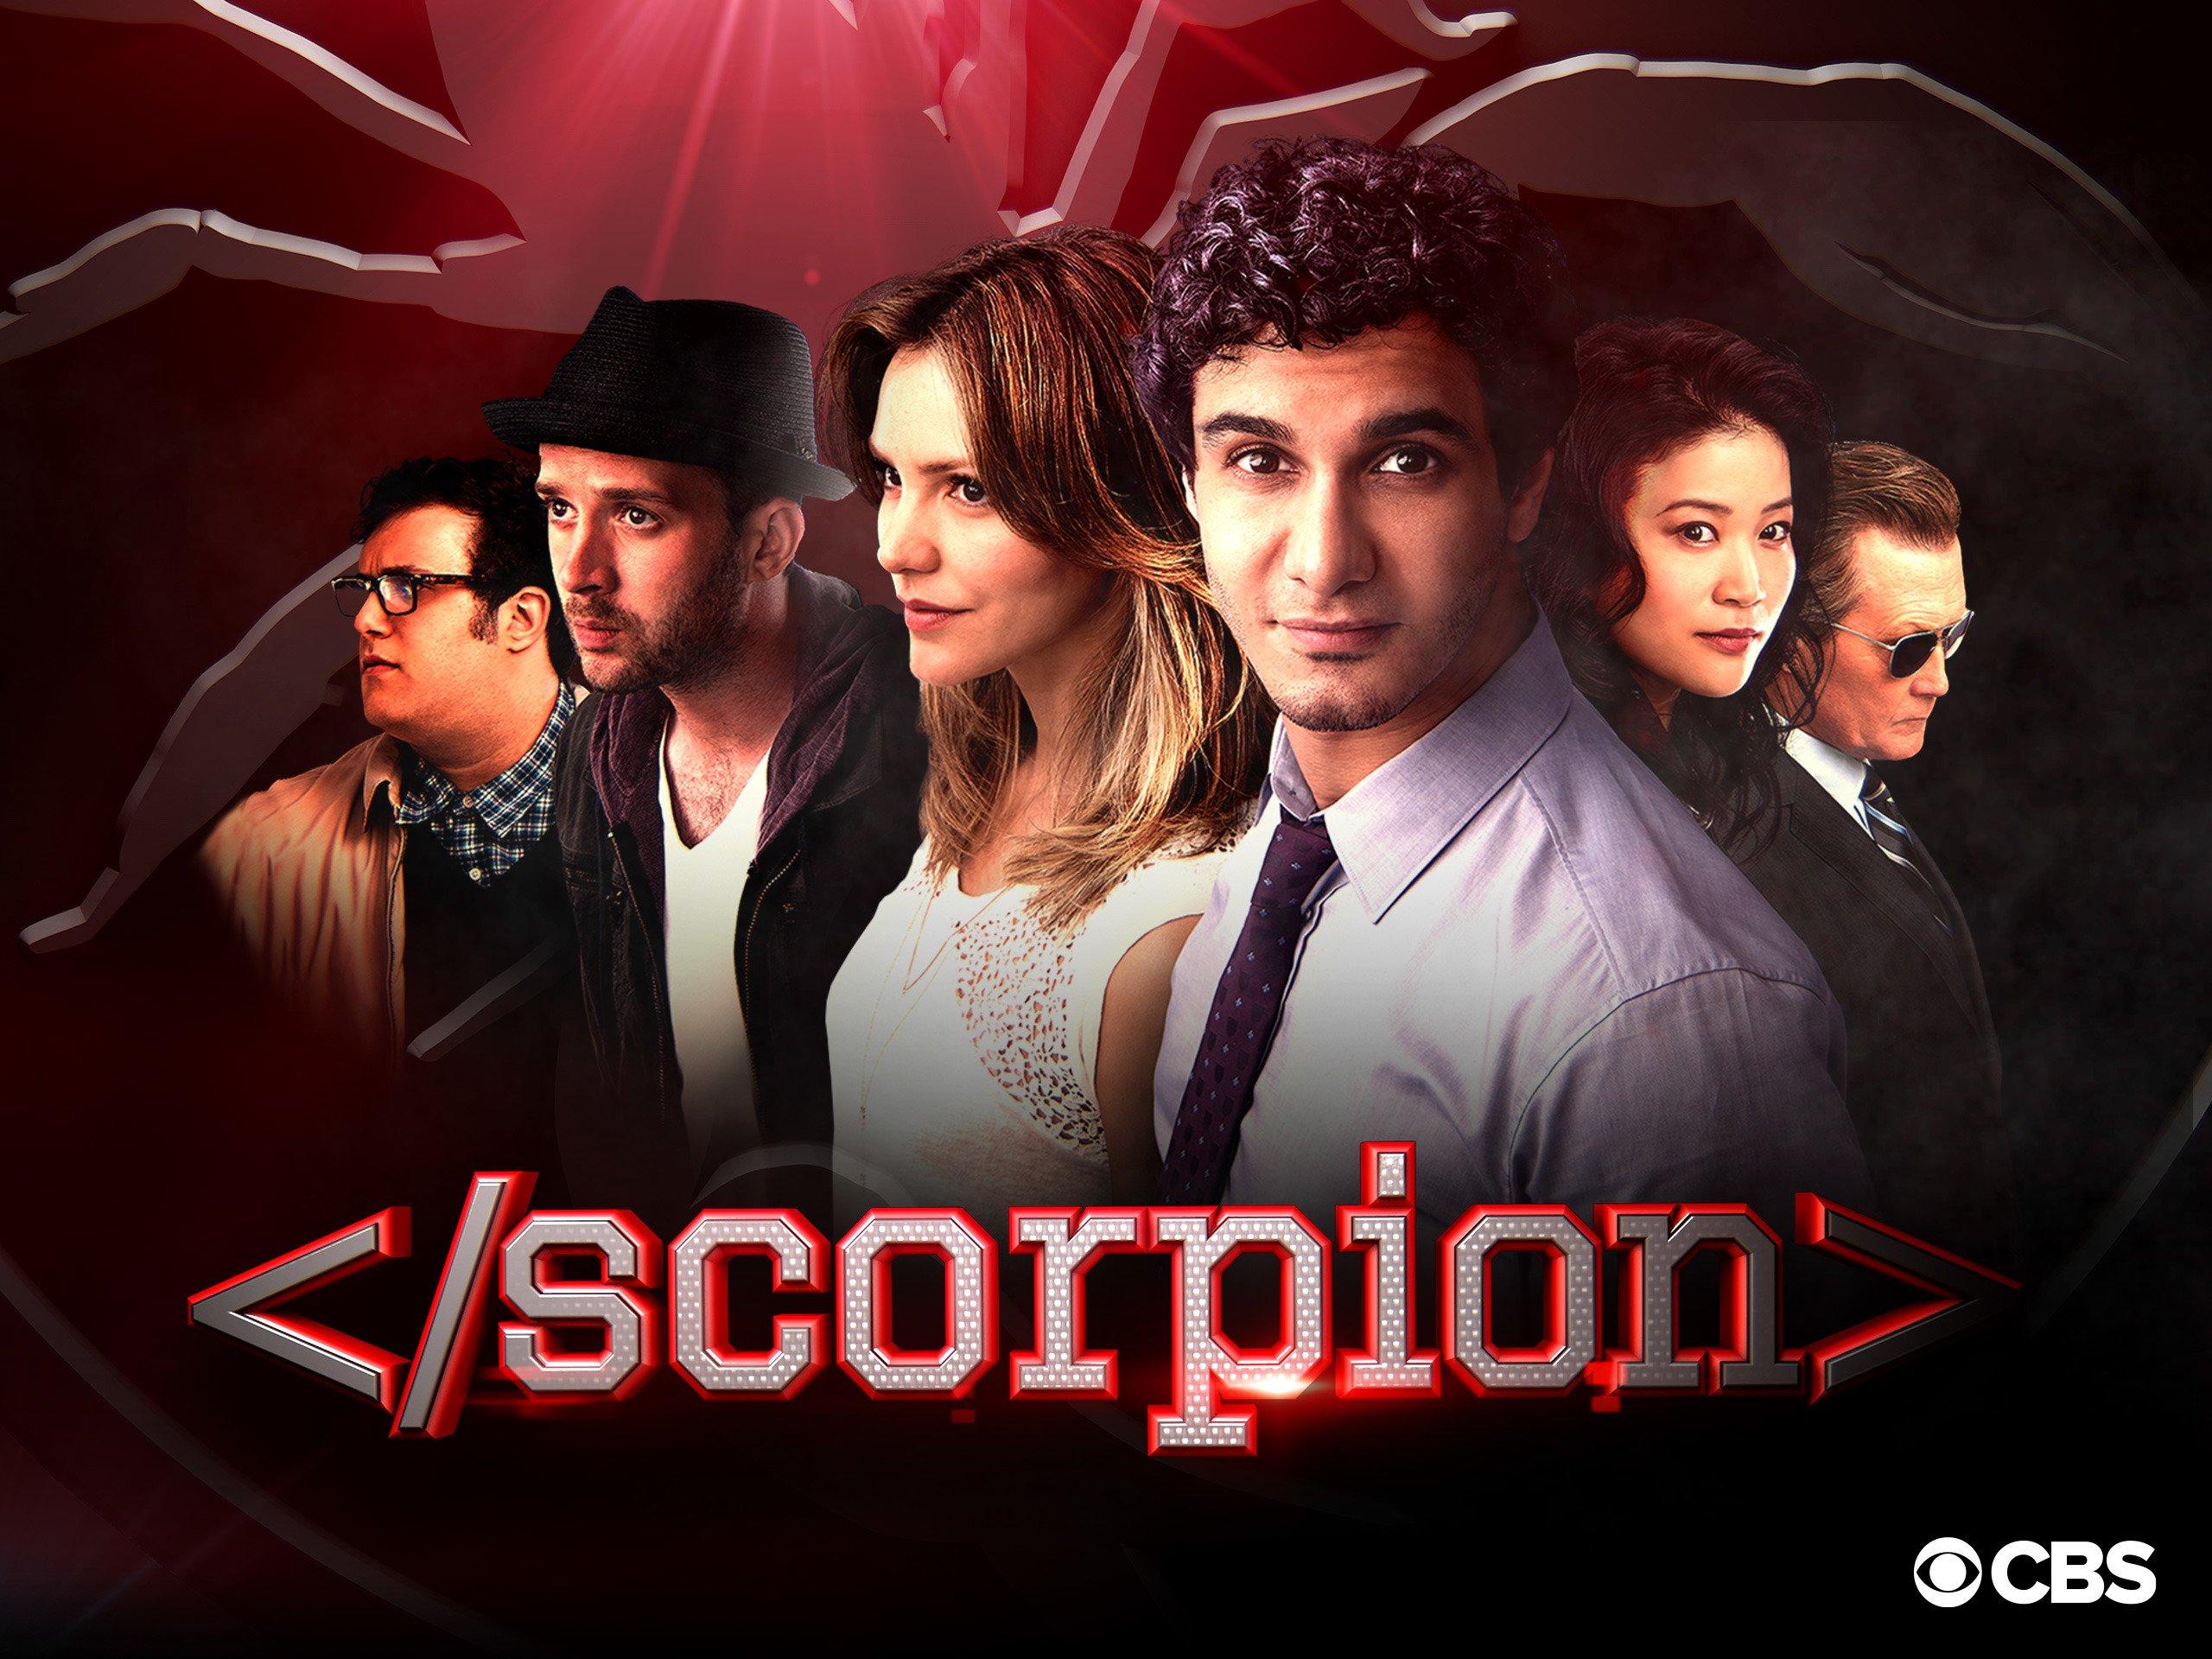 is scorpion on netflix usa